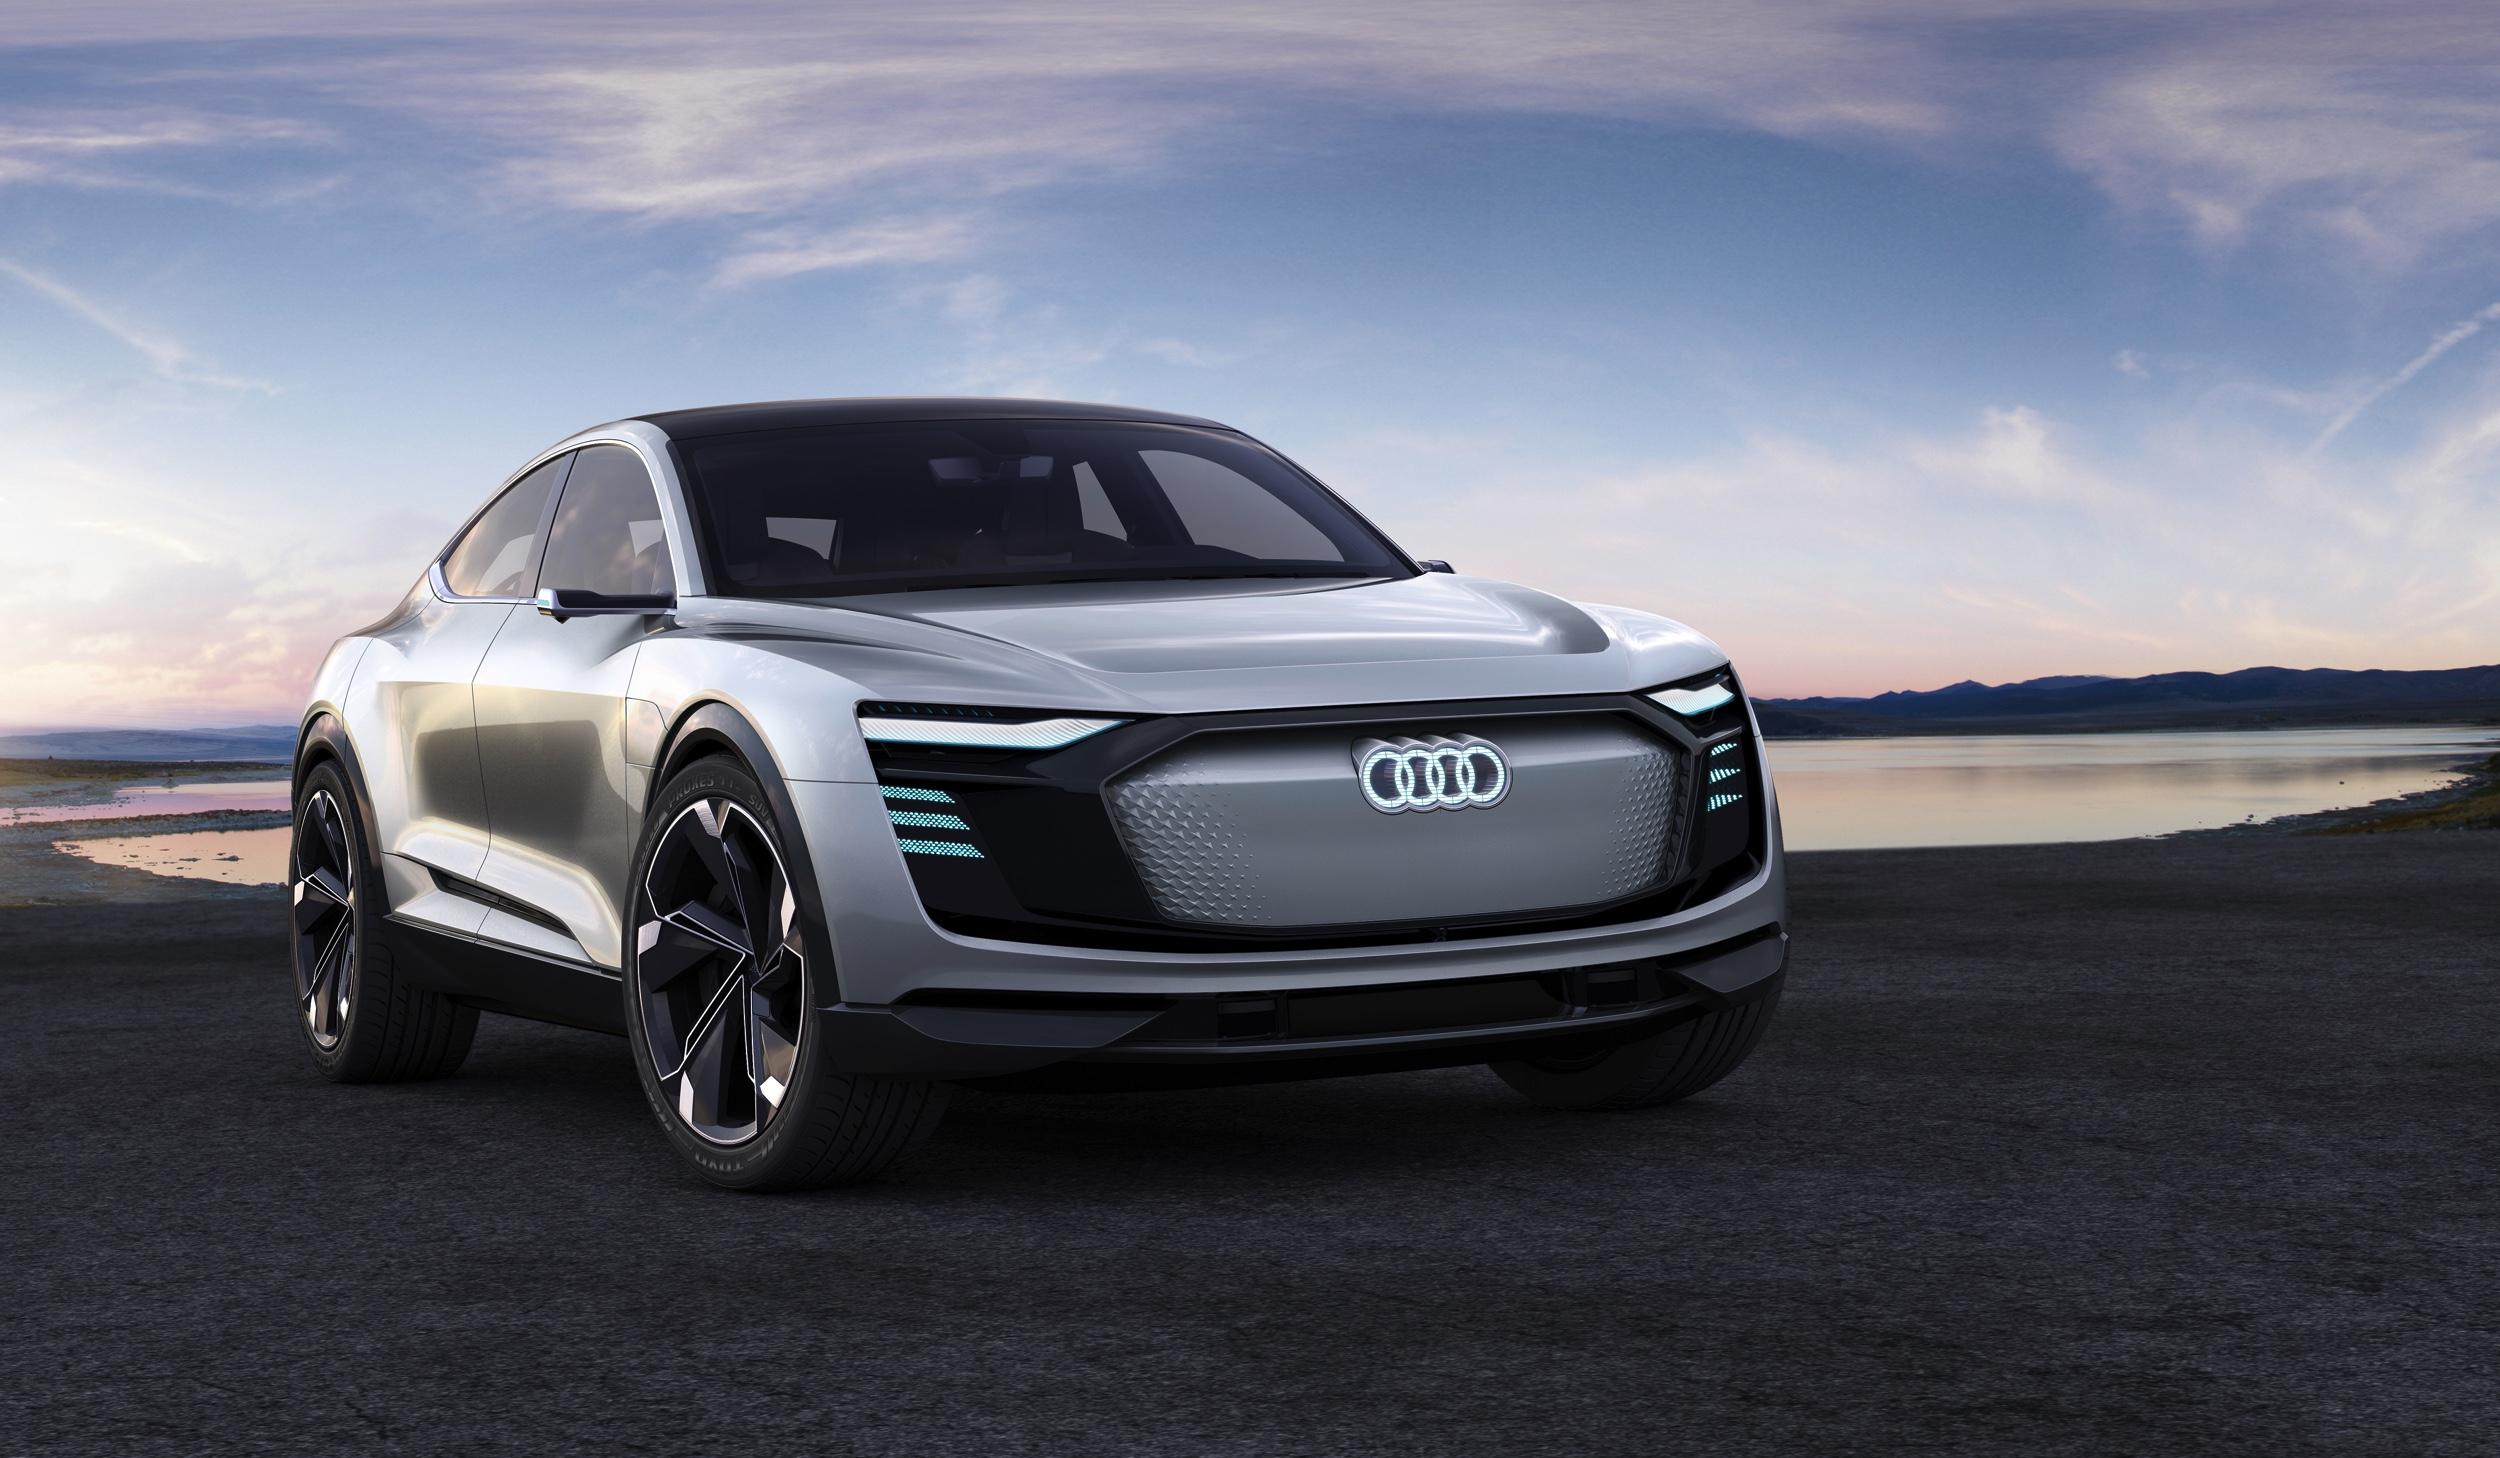 Audi e-tron Sportback - Autovisie.nl